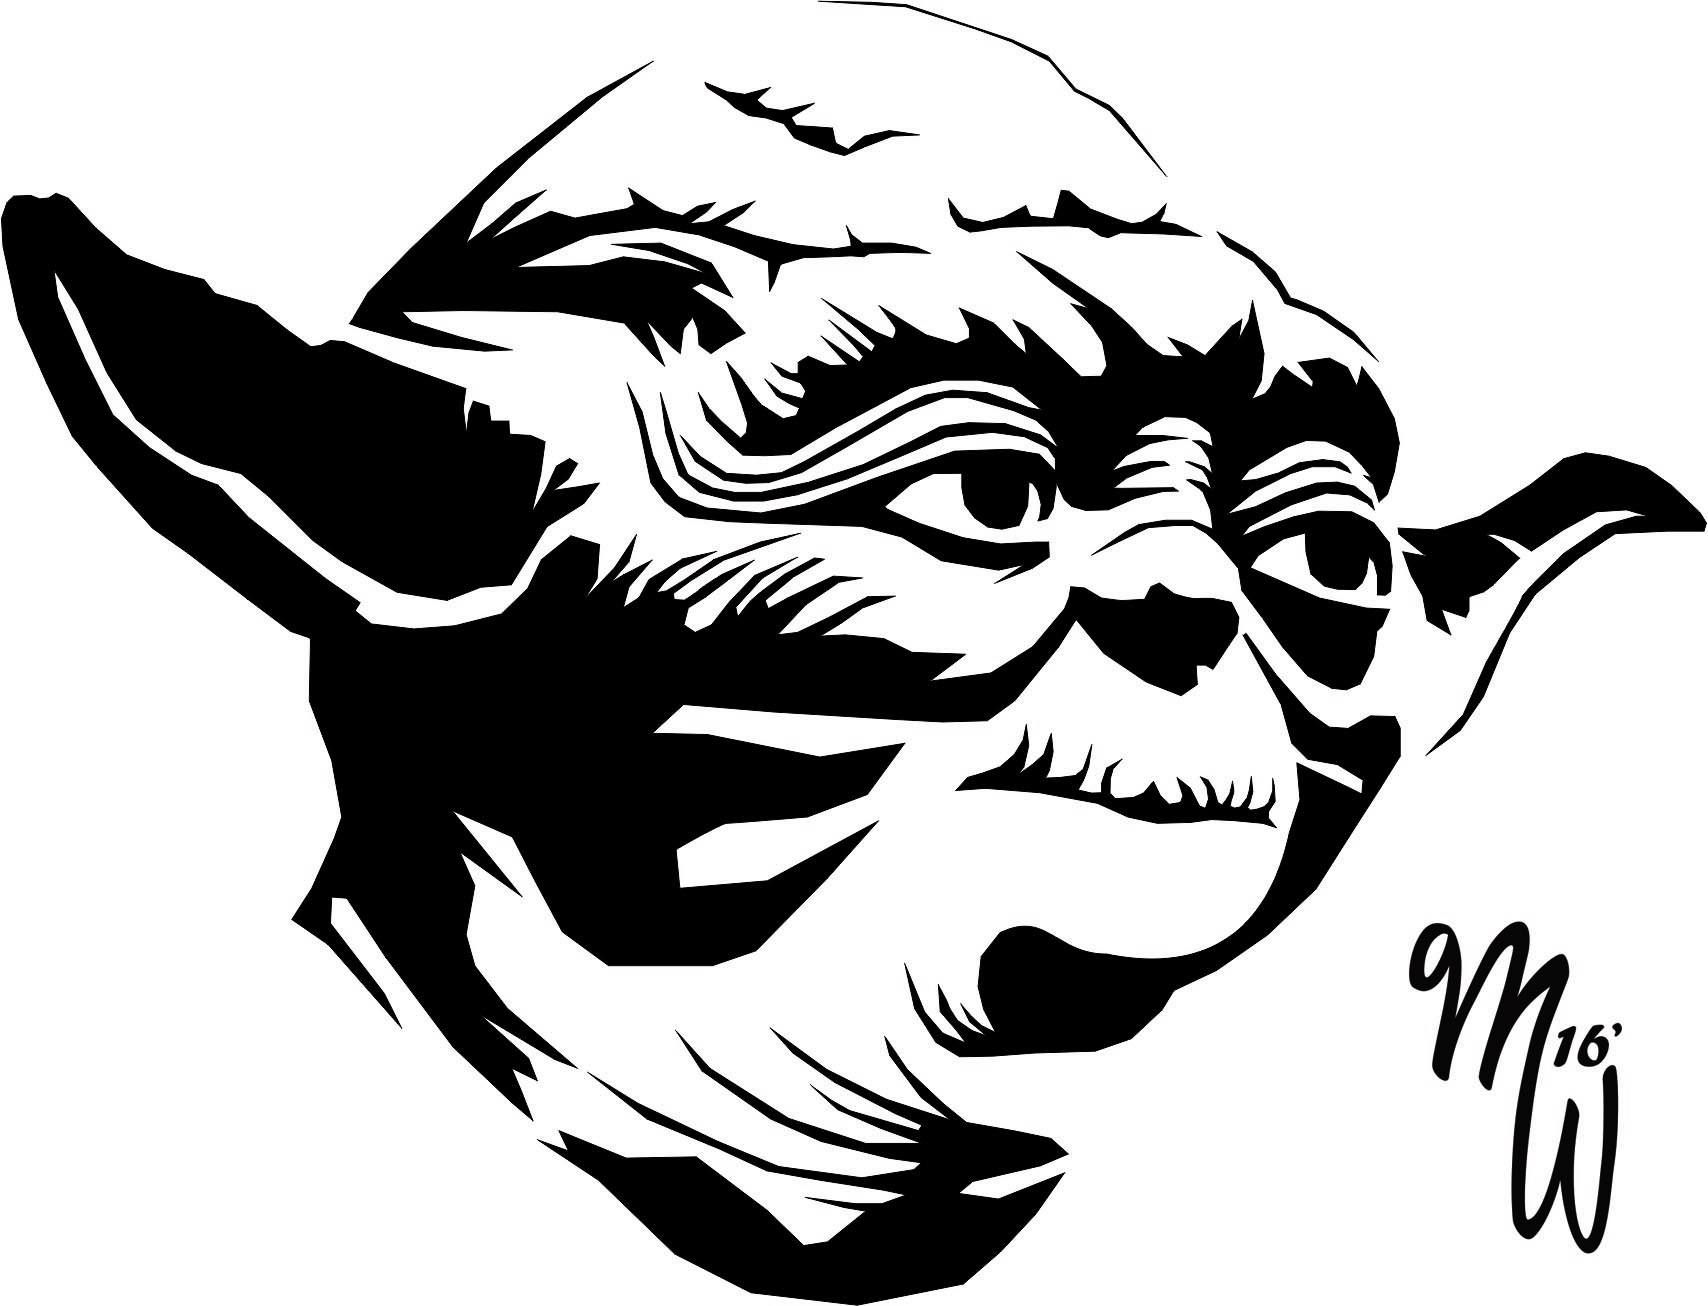 yoda vector wipmilliewright on deviantart em 2020